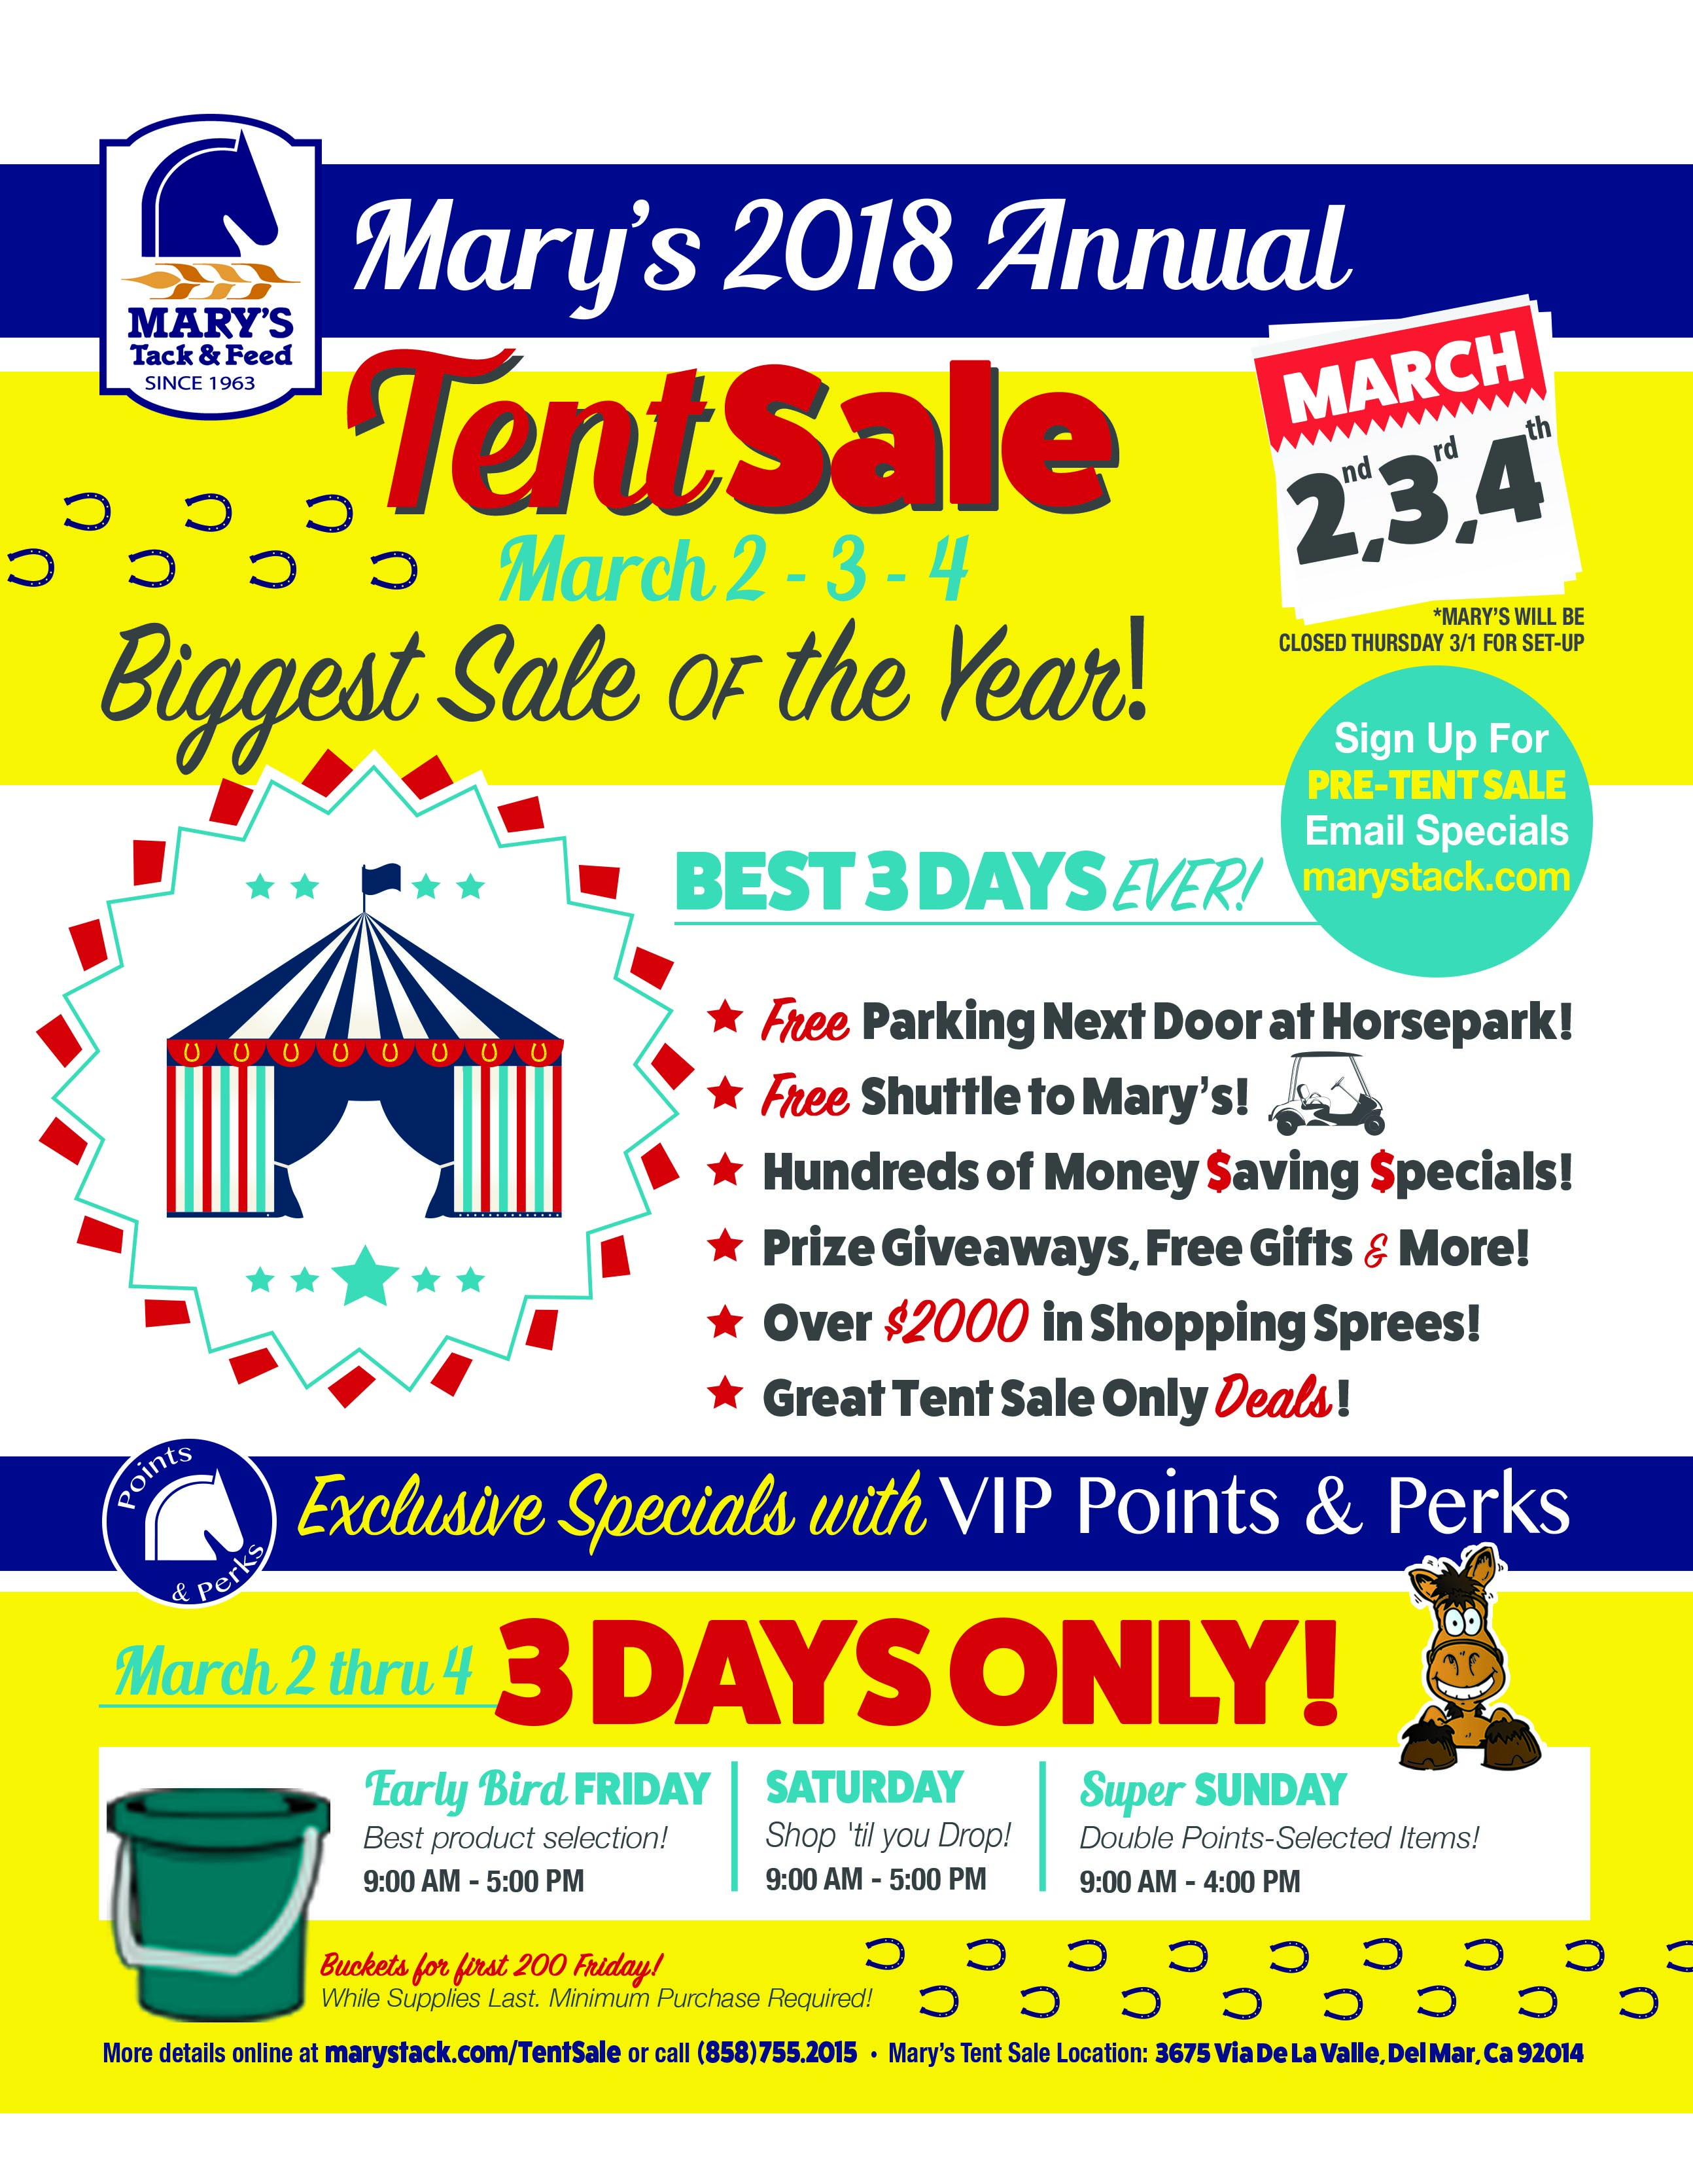 Tent Sale 2018 - March 2,3,4